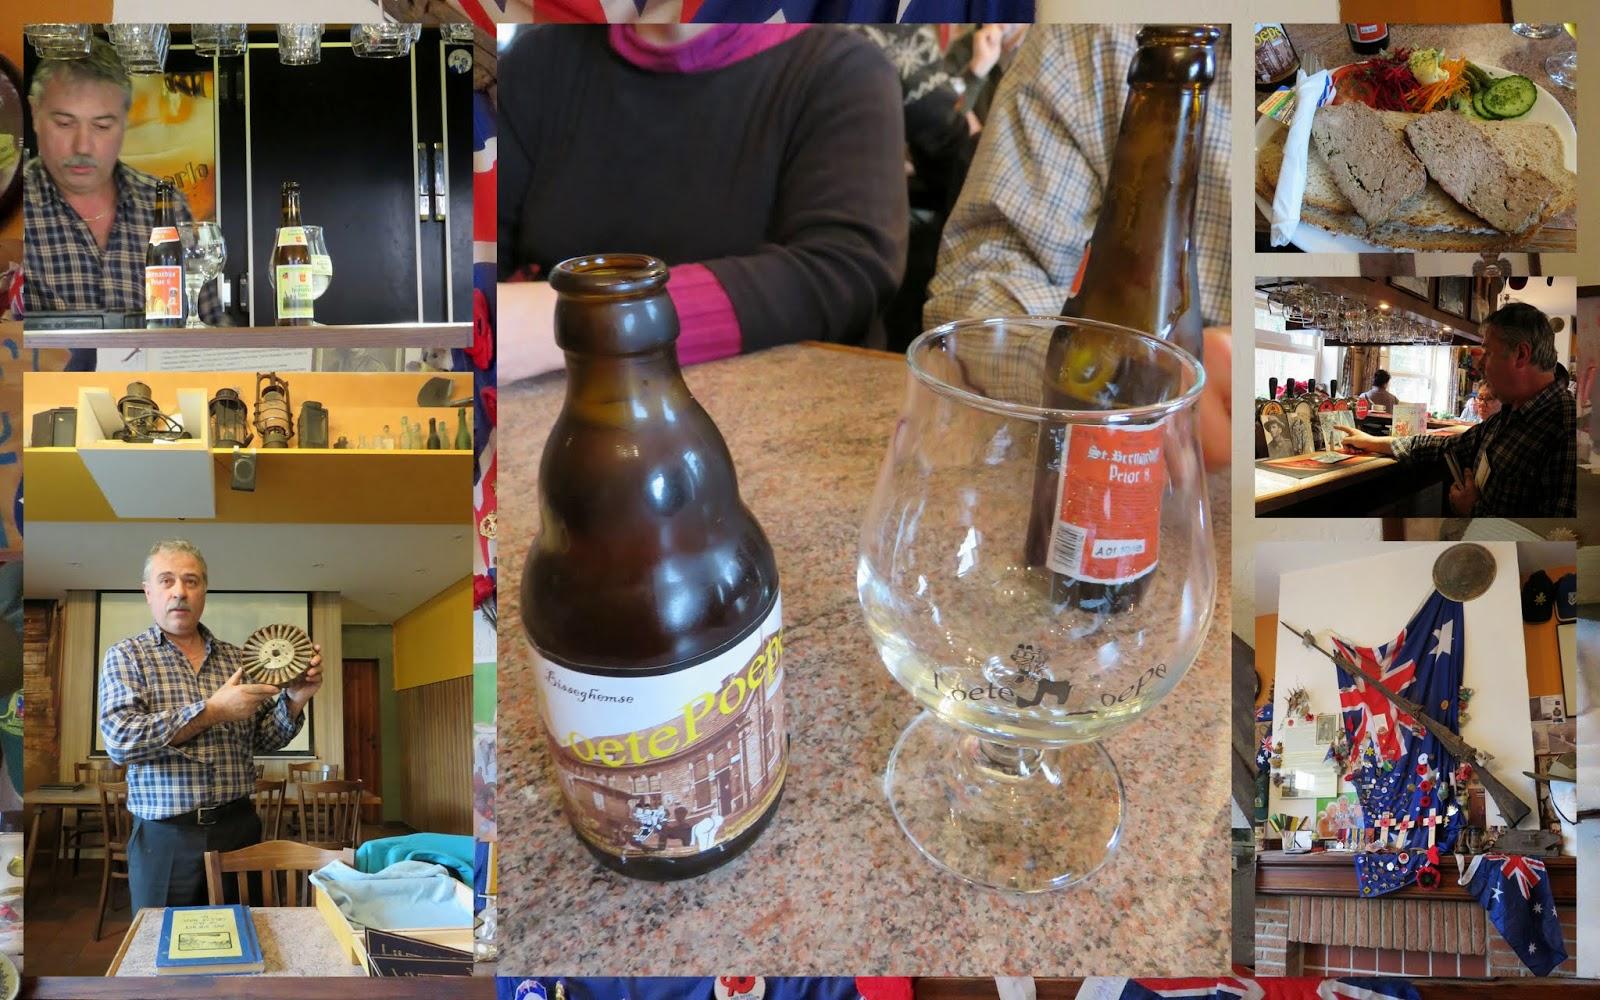 Cafe Taverne de Dreve in Flanders, Belgium